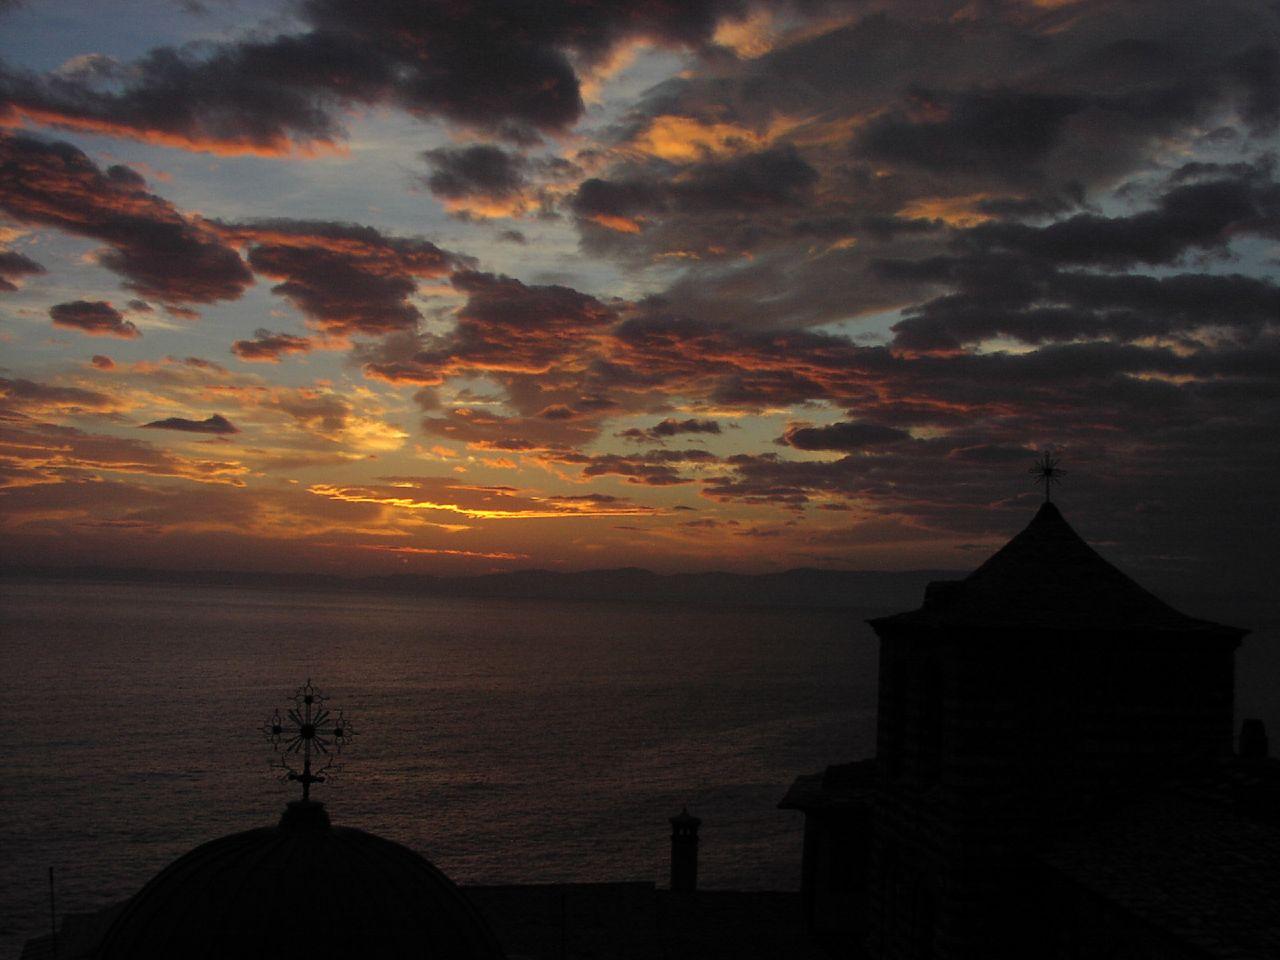 Sunset in Agio Oros,Greece